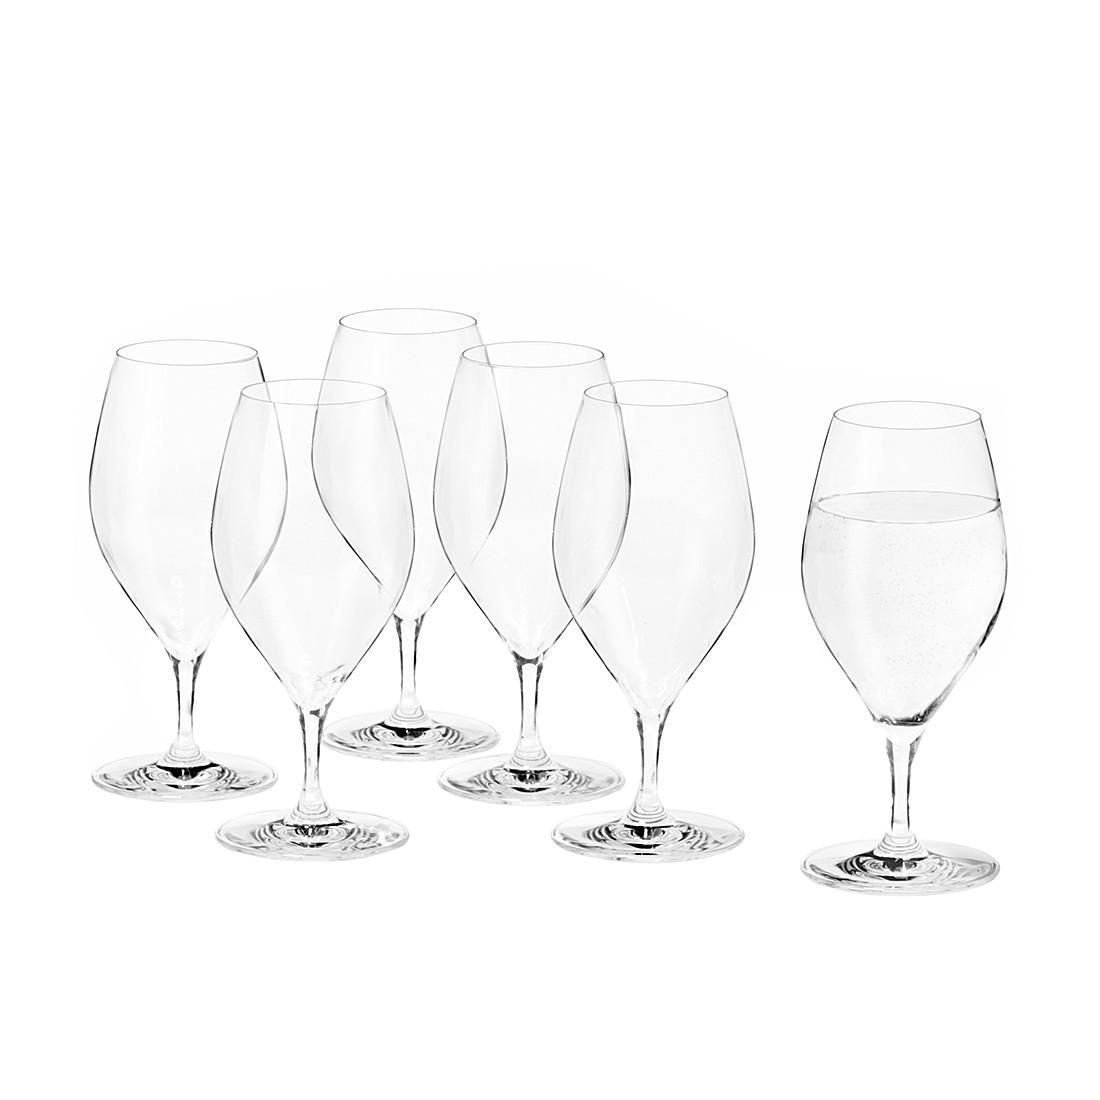 Wasserglas Rossini (6er-Set) – Klar, Leonardo online bestellen